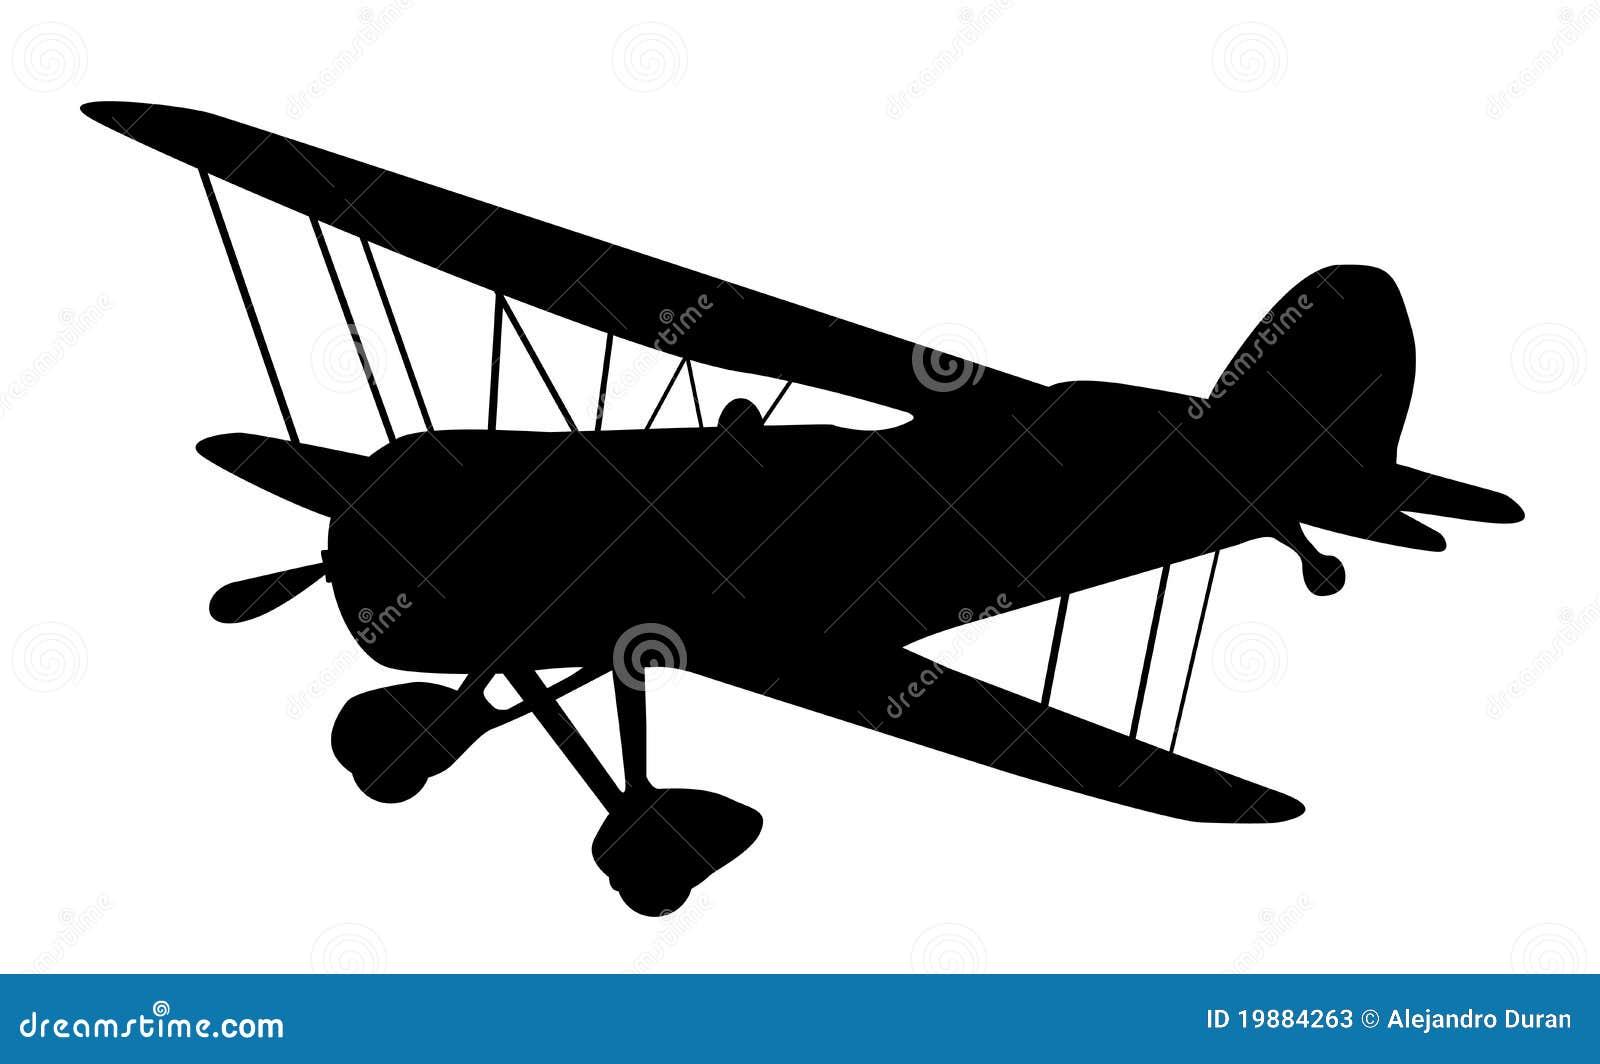 Vintage Biplane Silhouette Stock Vector Illustration Of